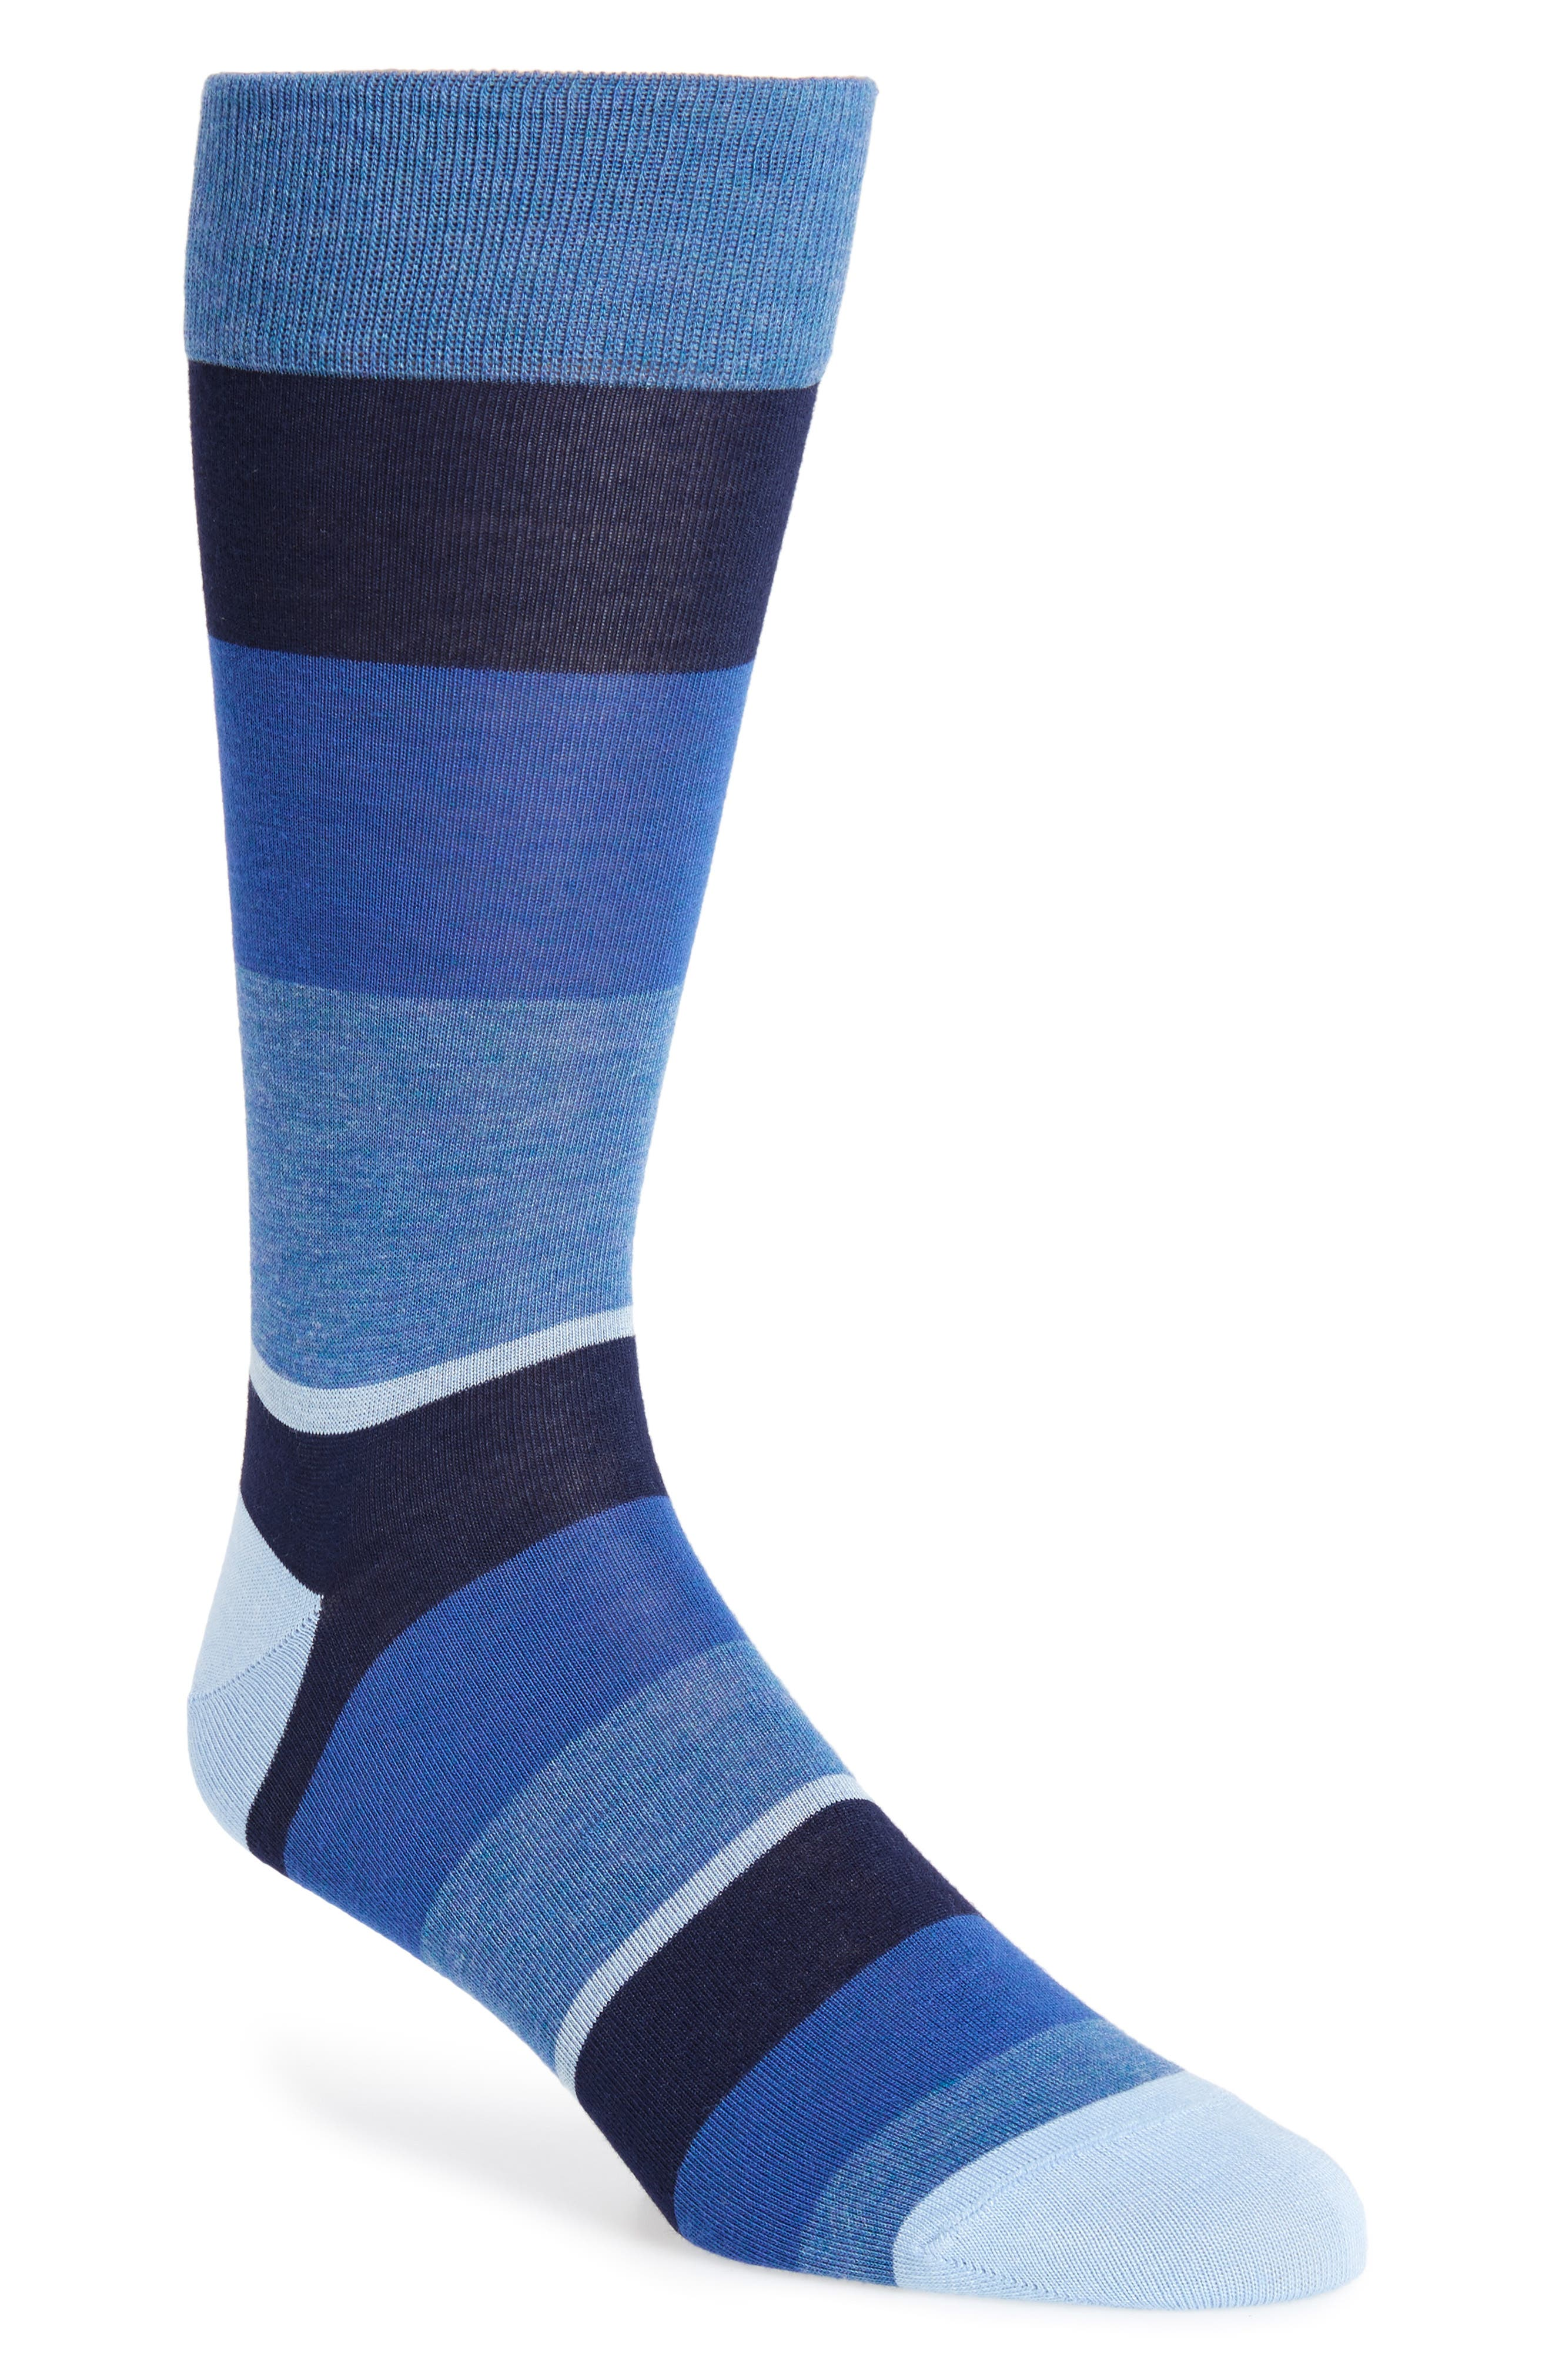 Calibrate Colorblock Socks (3 for $30)